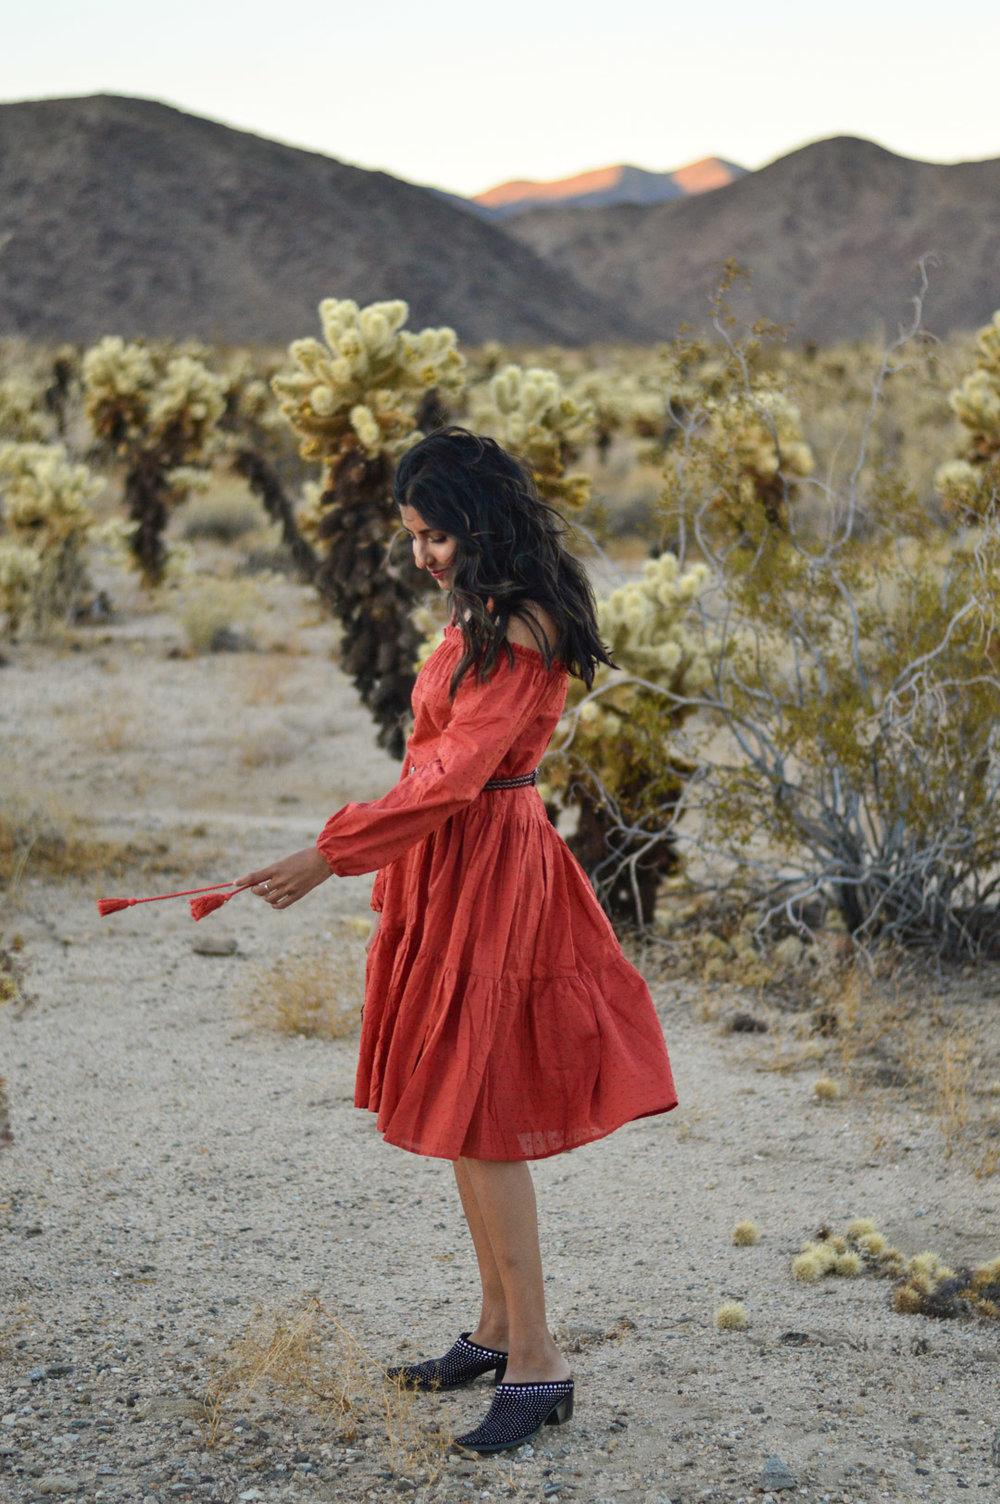 cholla-cactus-garden-joshua-tree-tassels-dress-fashion-blogger-boho-chic 3